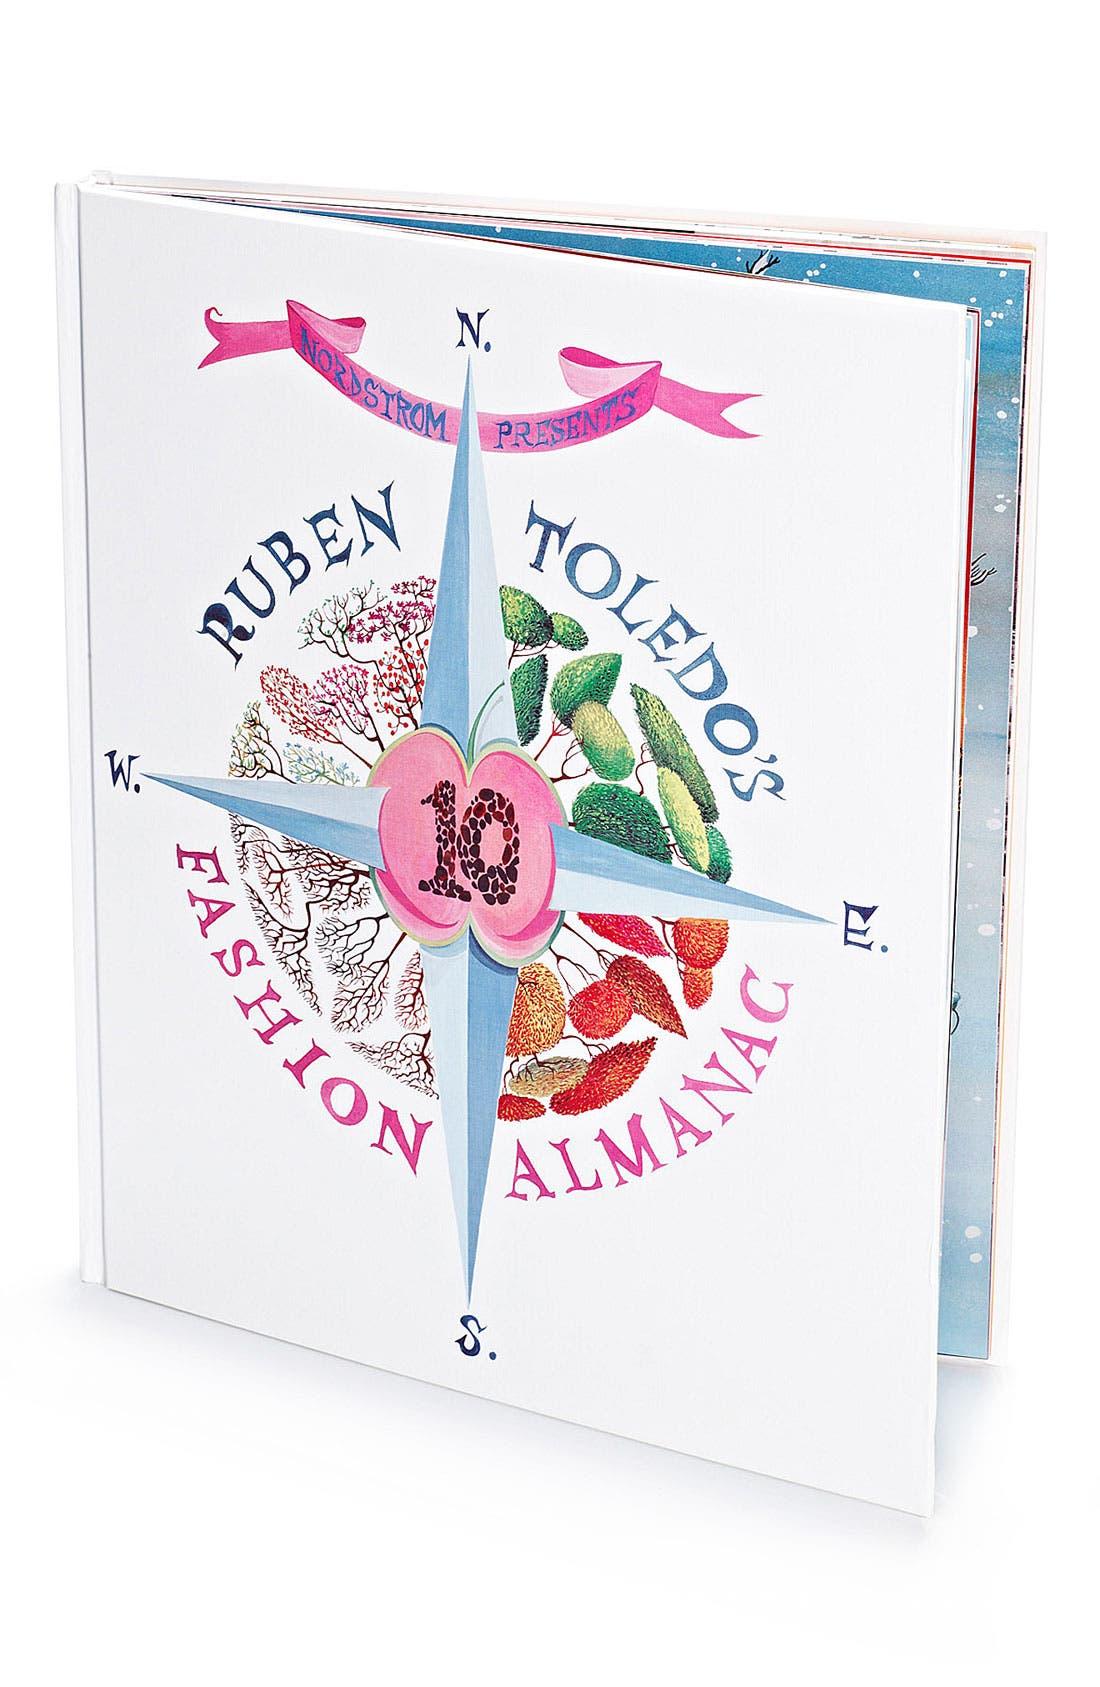 Alternate Image 1 Selected - Ruben Toledo's Fashion Almanac Book (Nordstrom Exclusive)